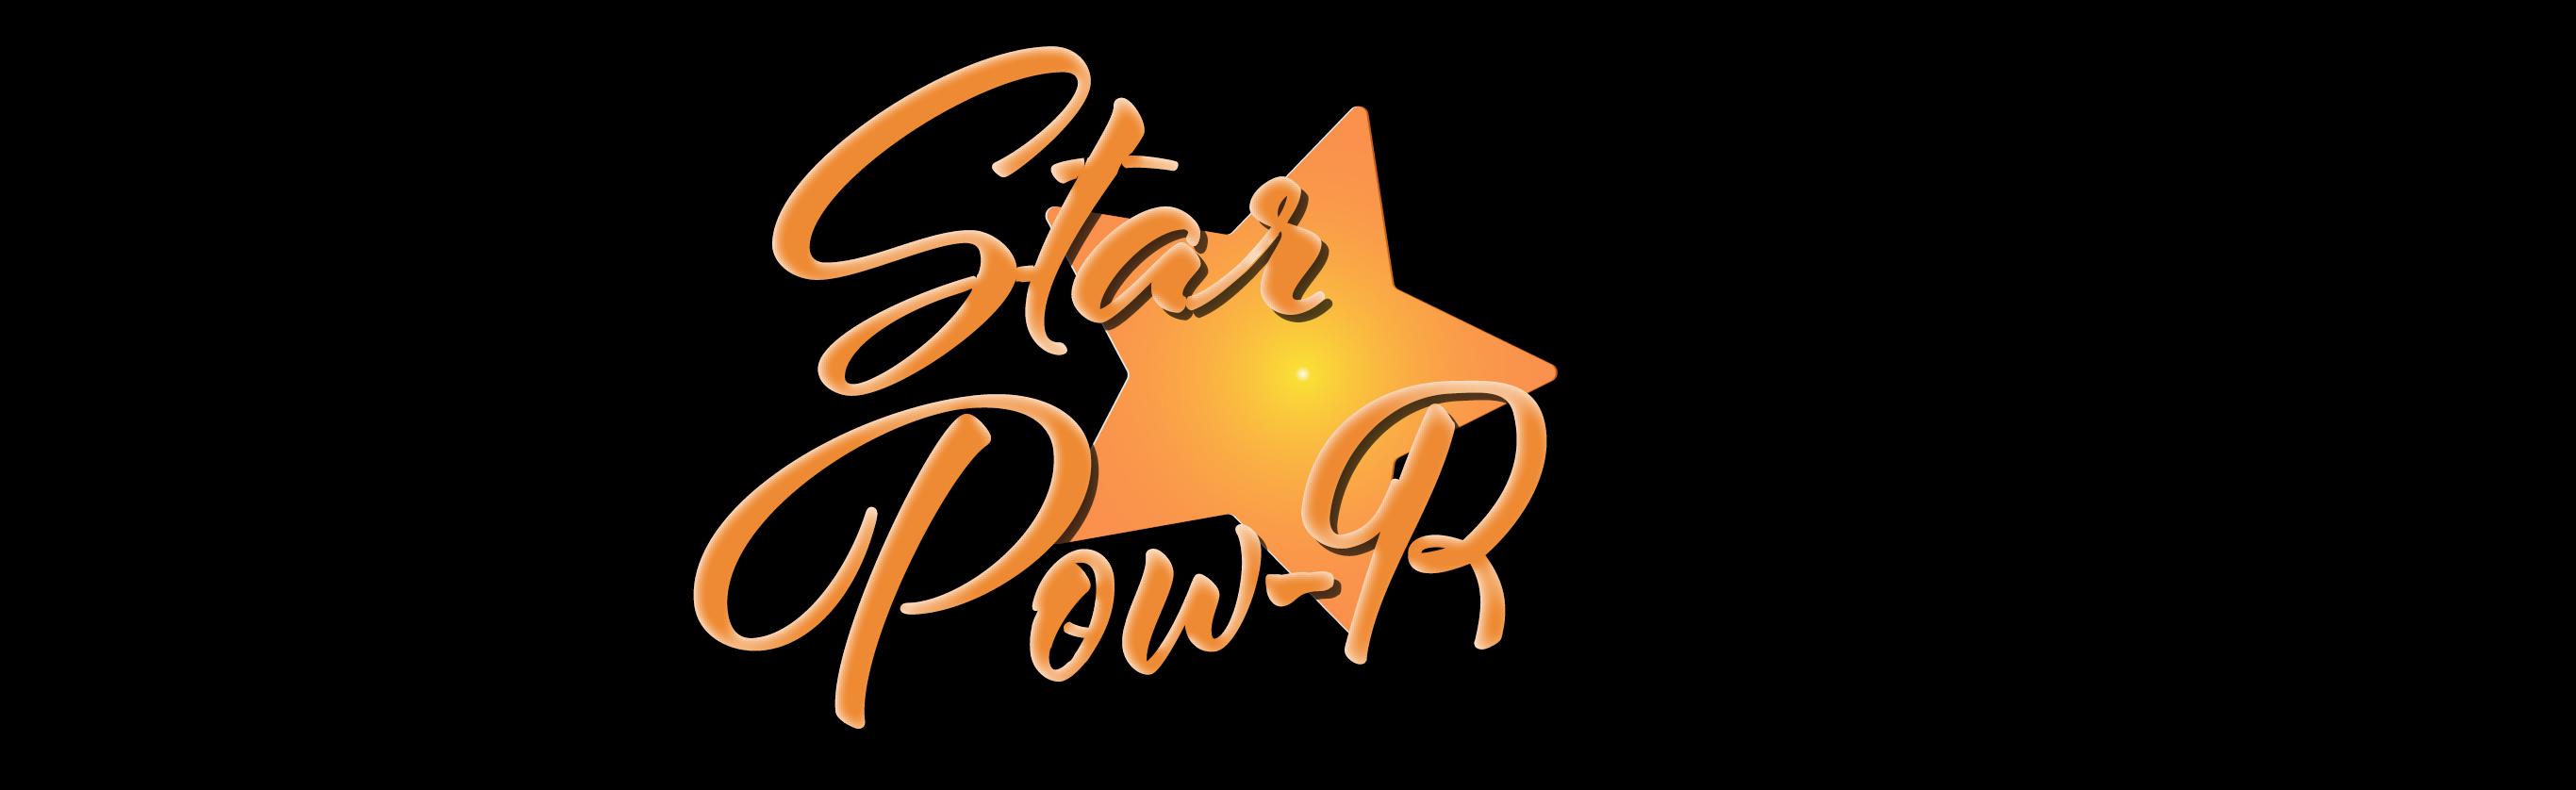 Star Pow-R